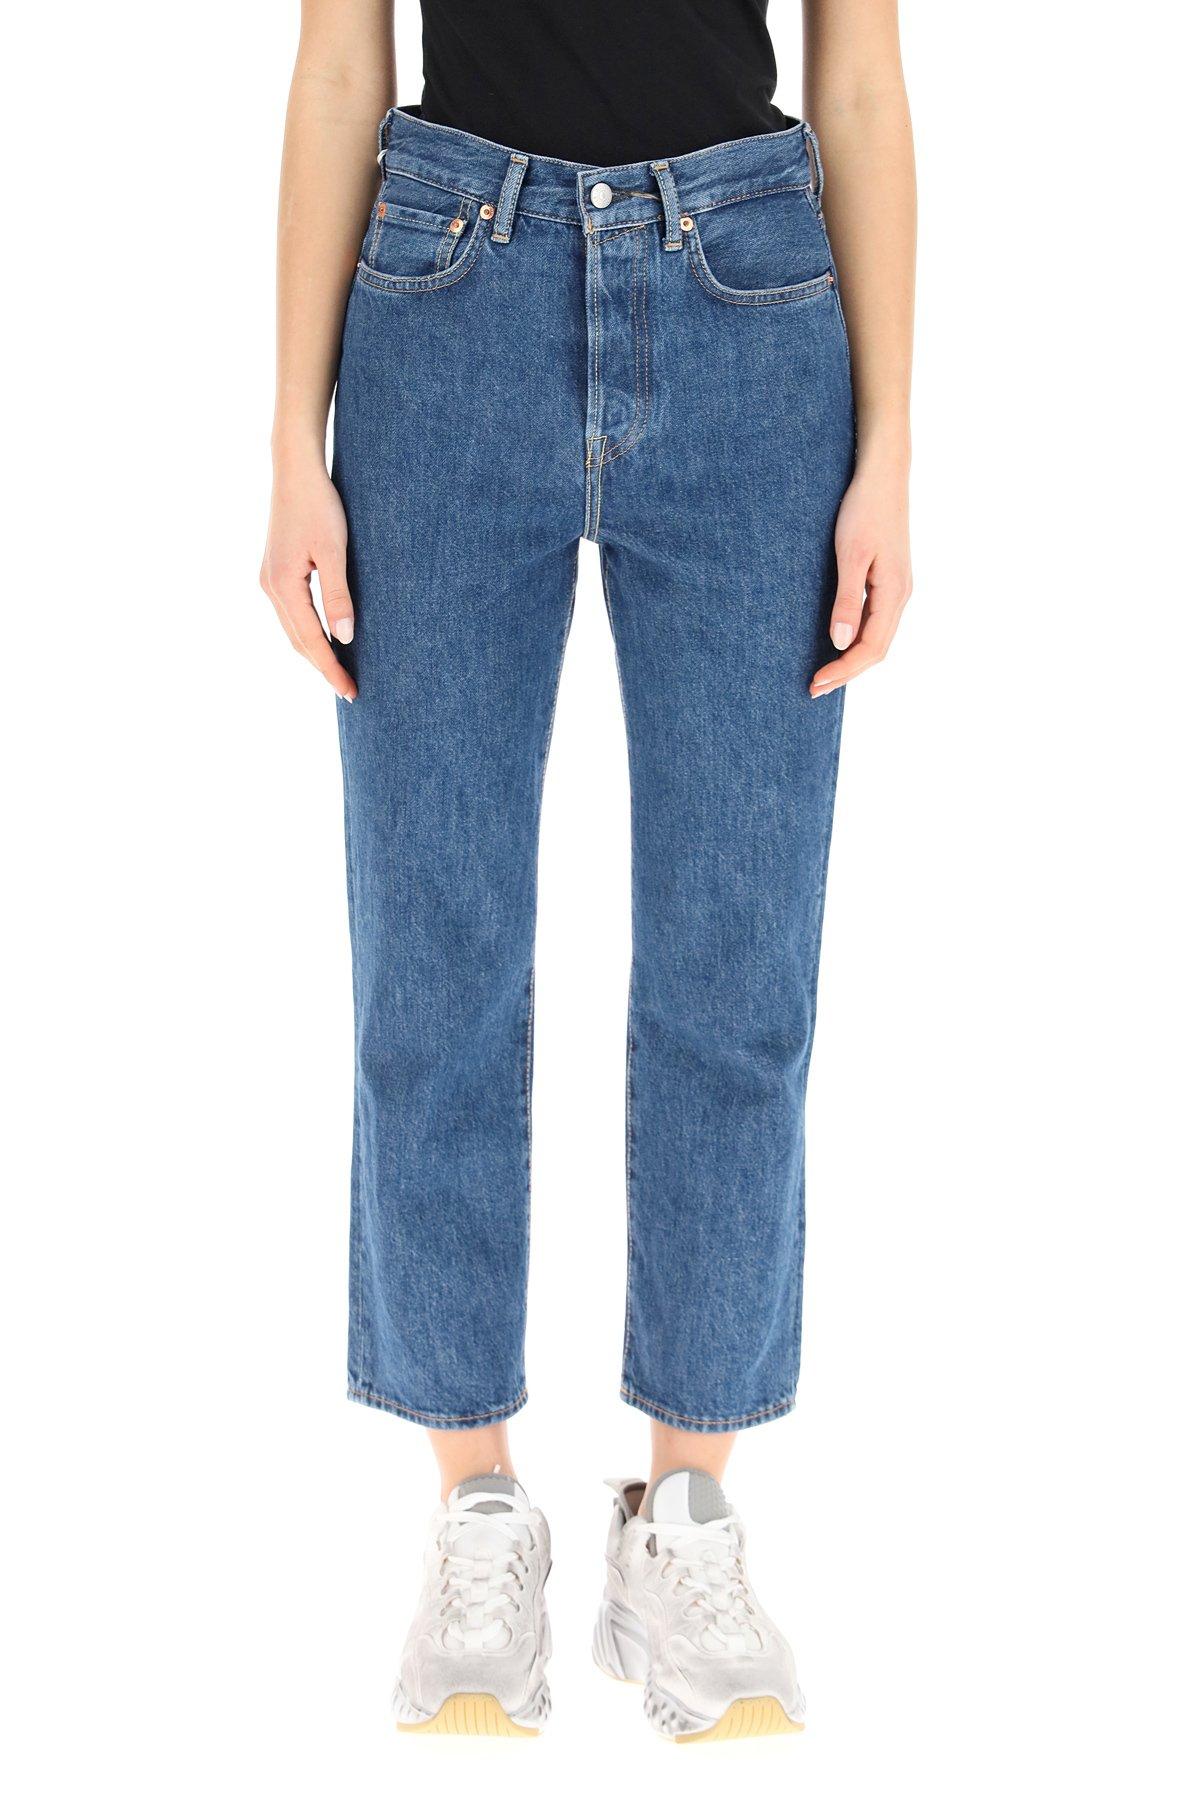 Acne studios jeans trash mece straight fit